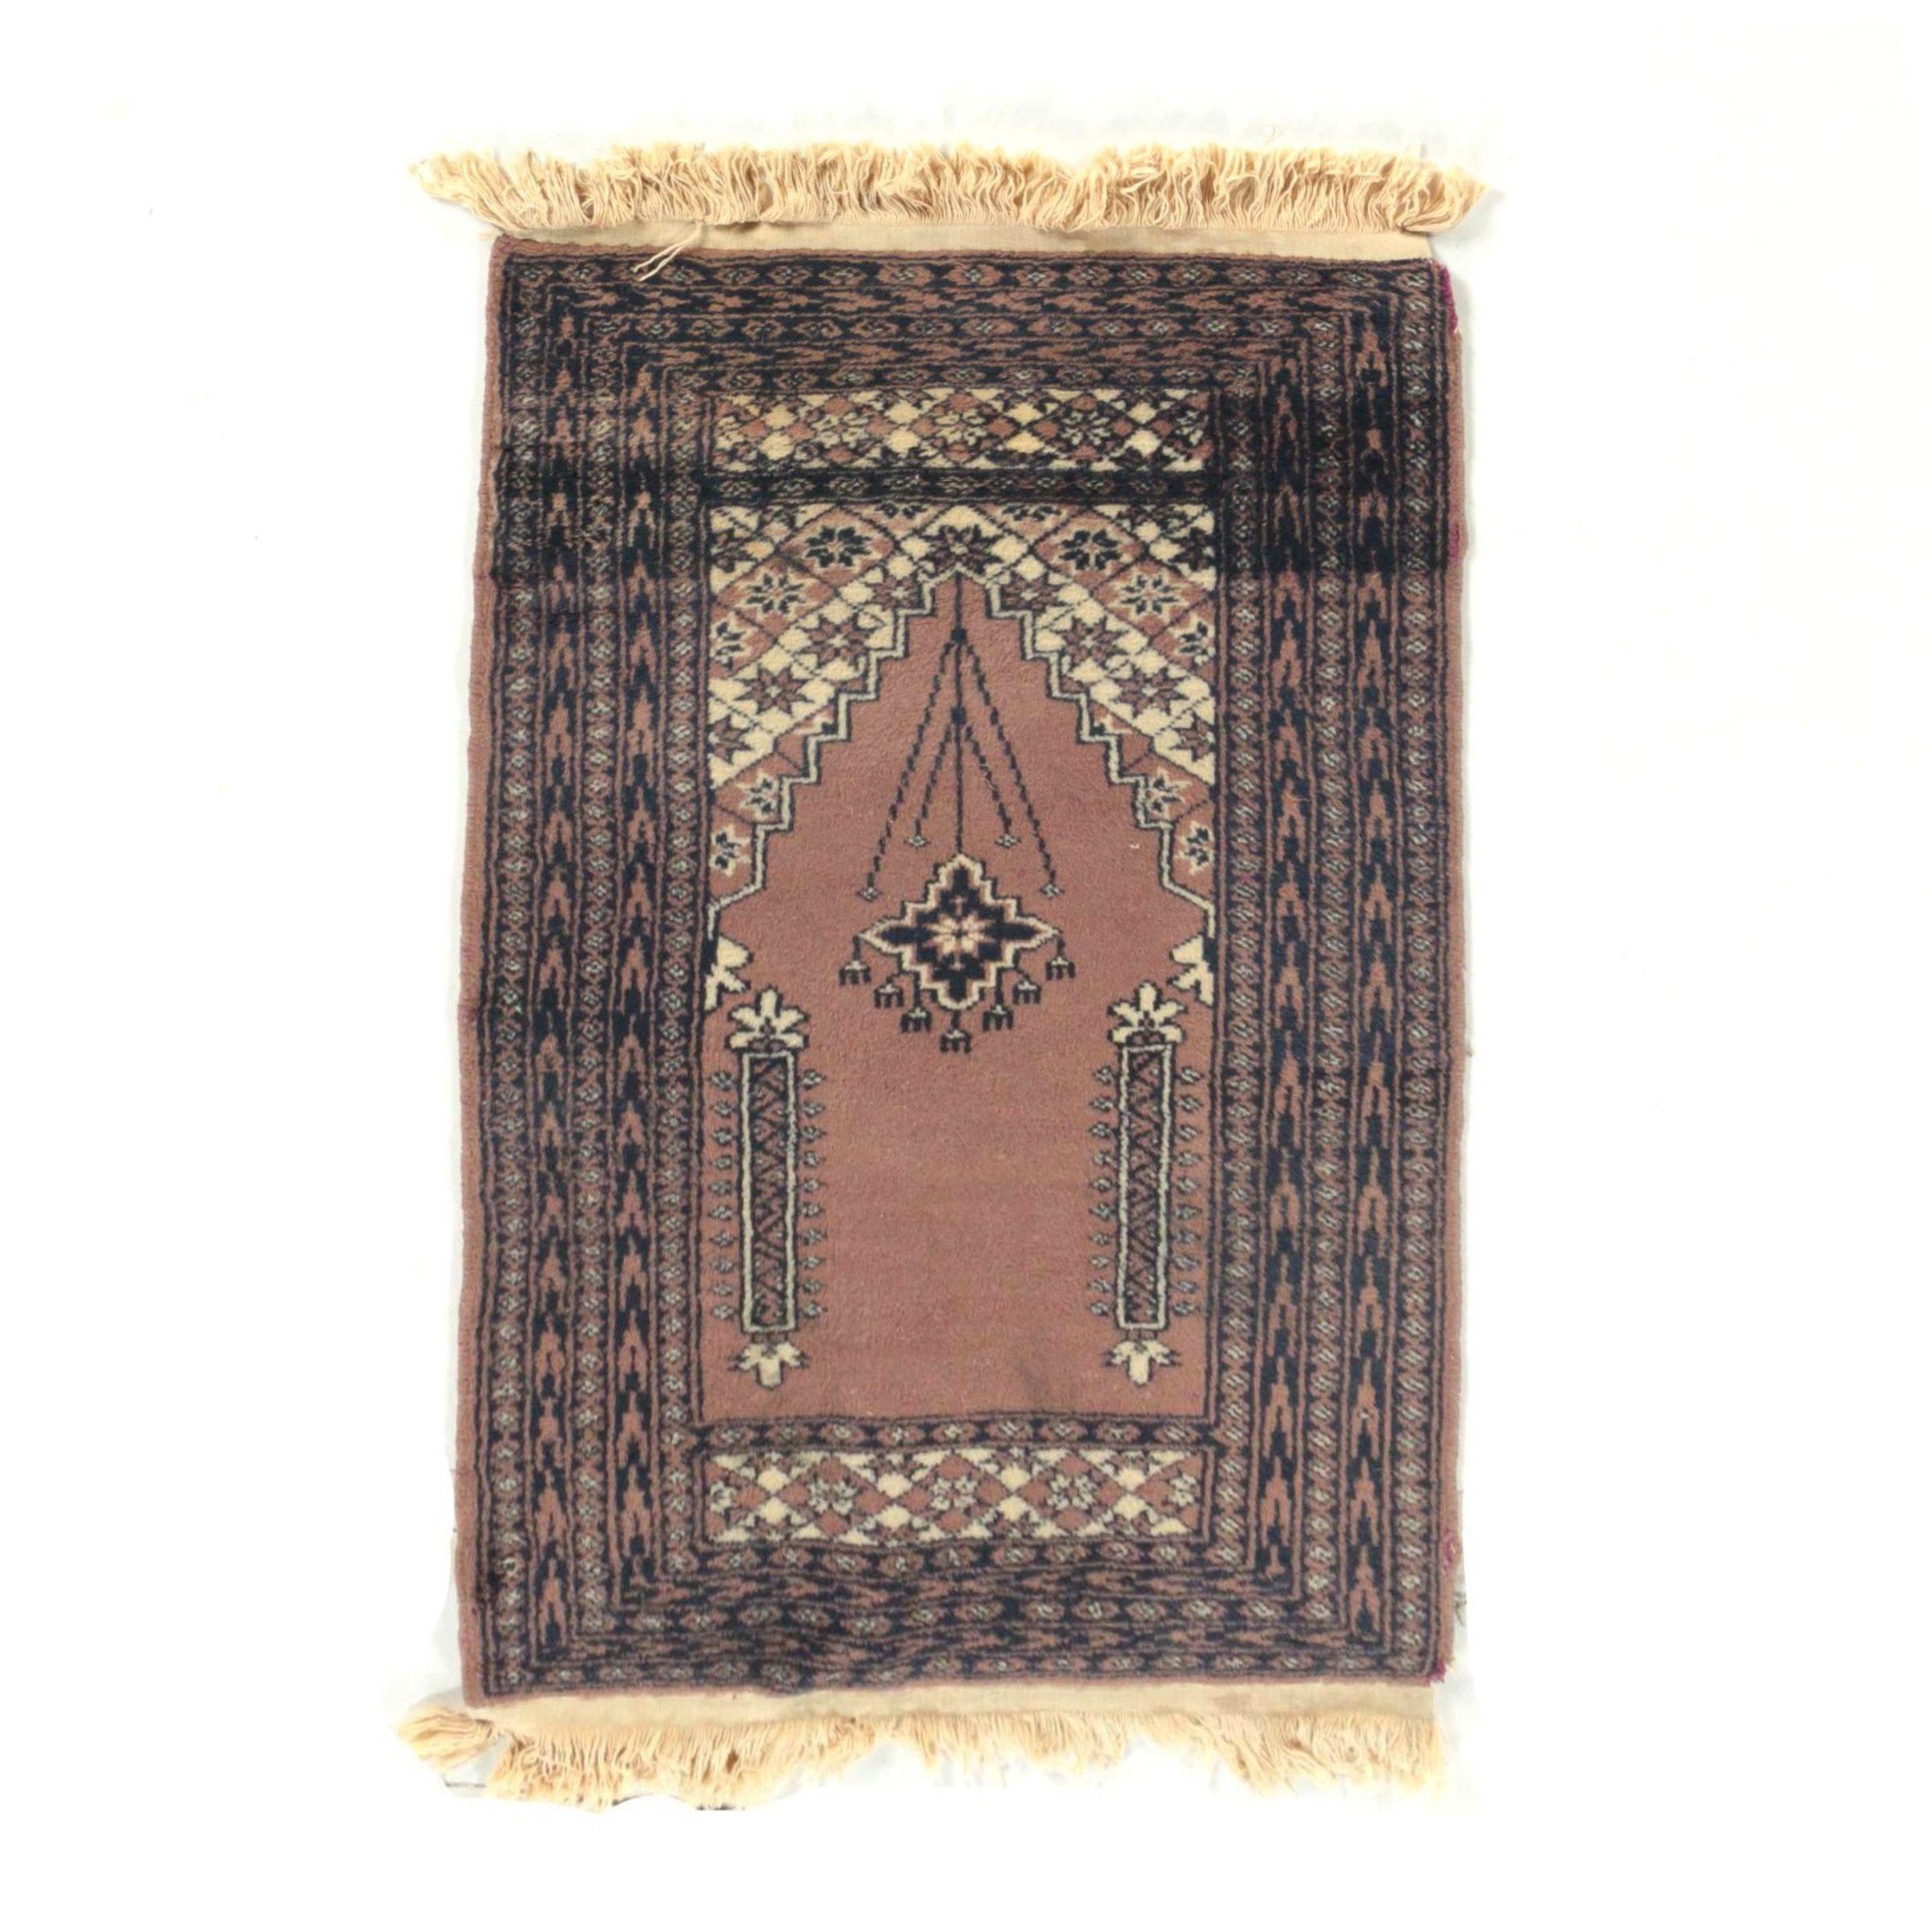 Hand-Knotted Pakistani Wool Prayer Rug